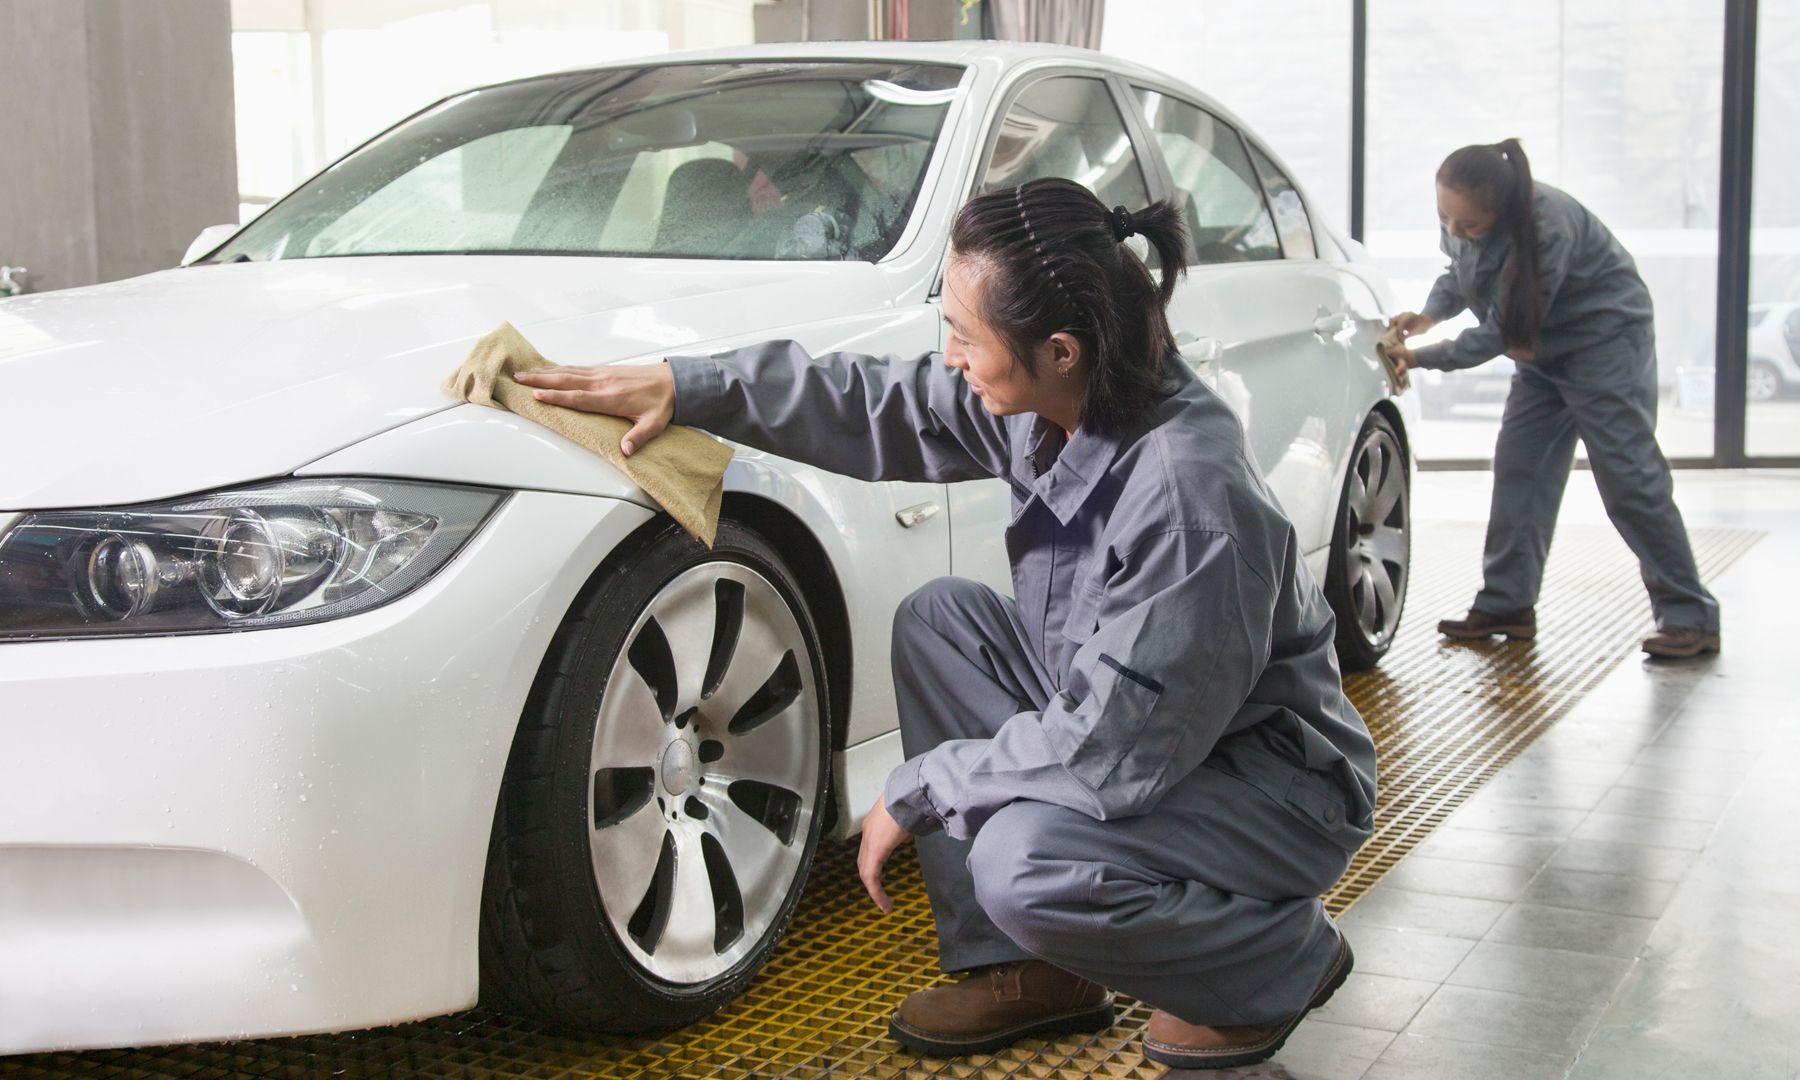 Make your car last 250,000 miles Car detailing, Used car